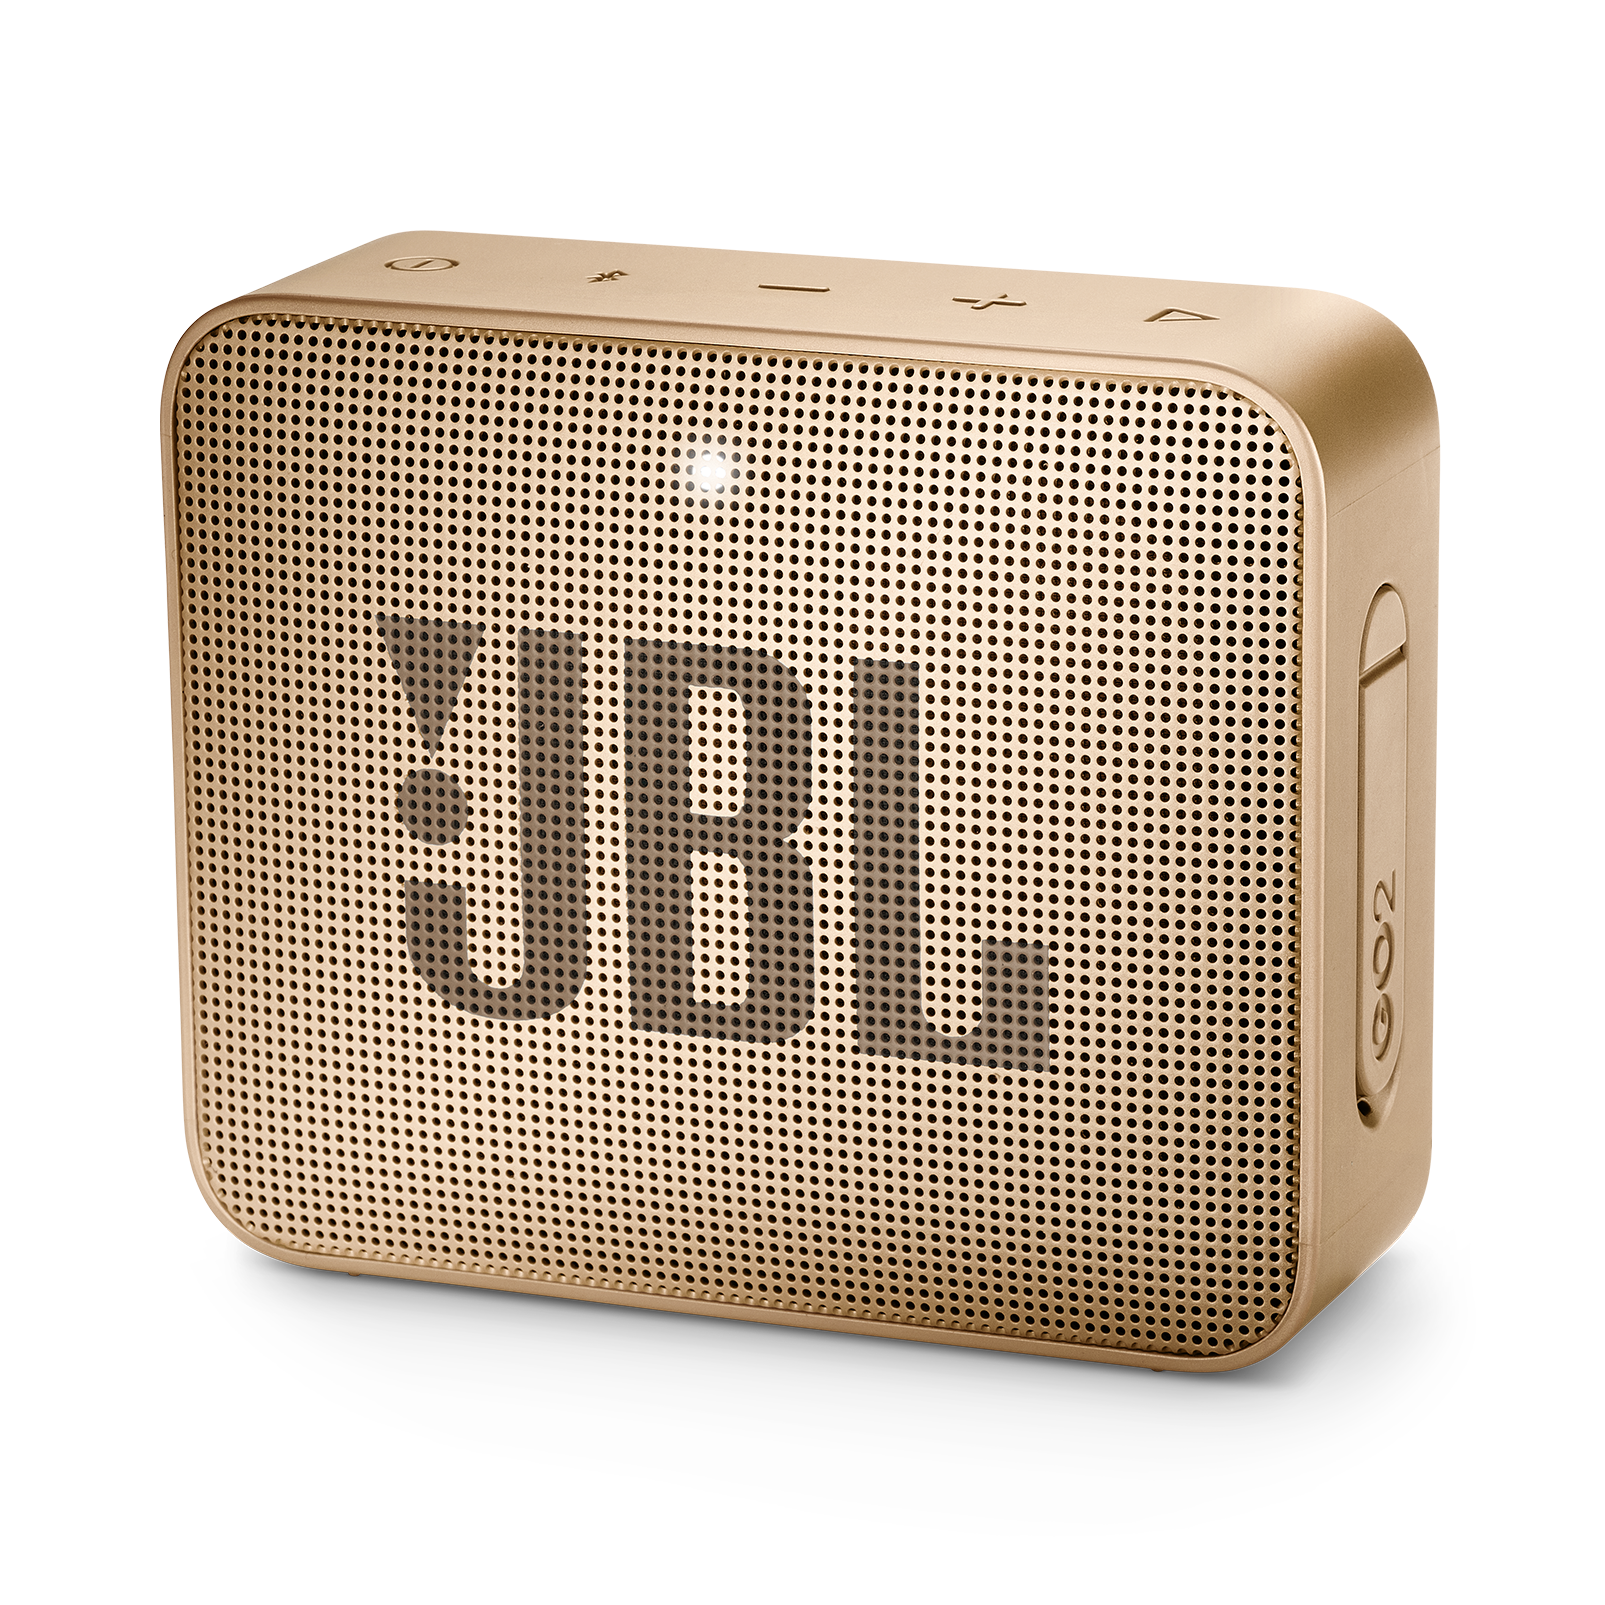 JBL GO 2 Portable Wireless Speaker - Champagne Gold (GO2-CGD)